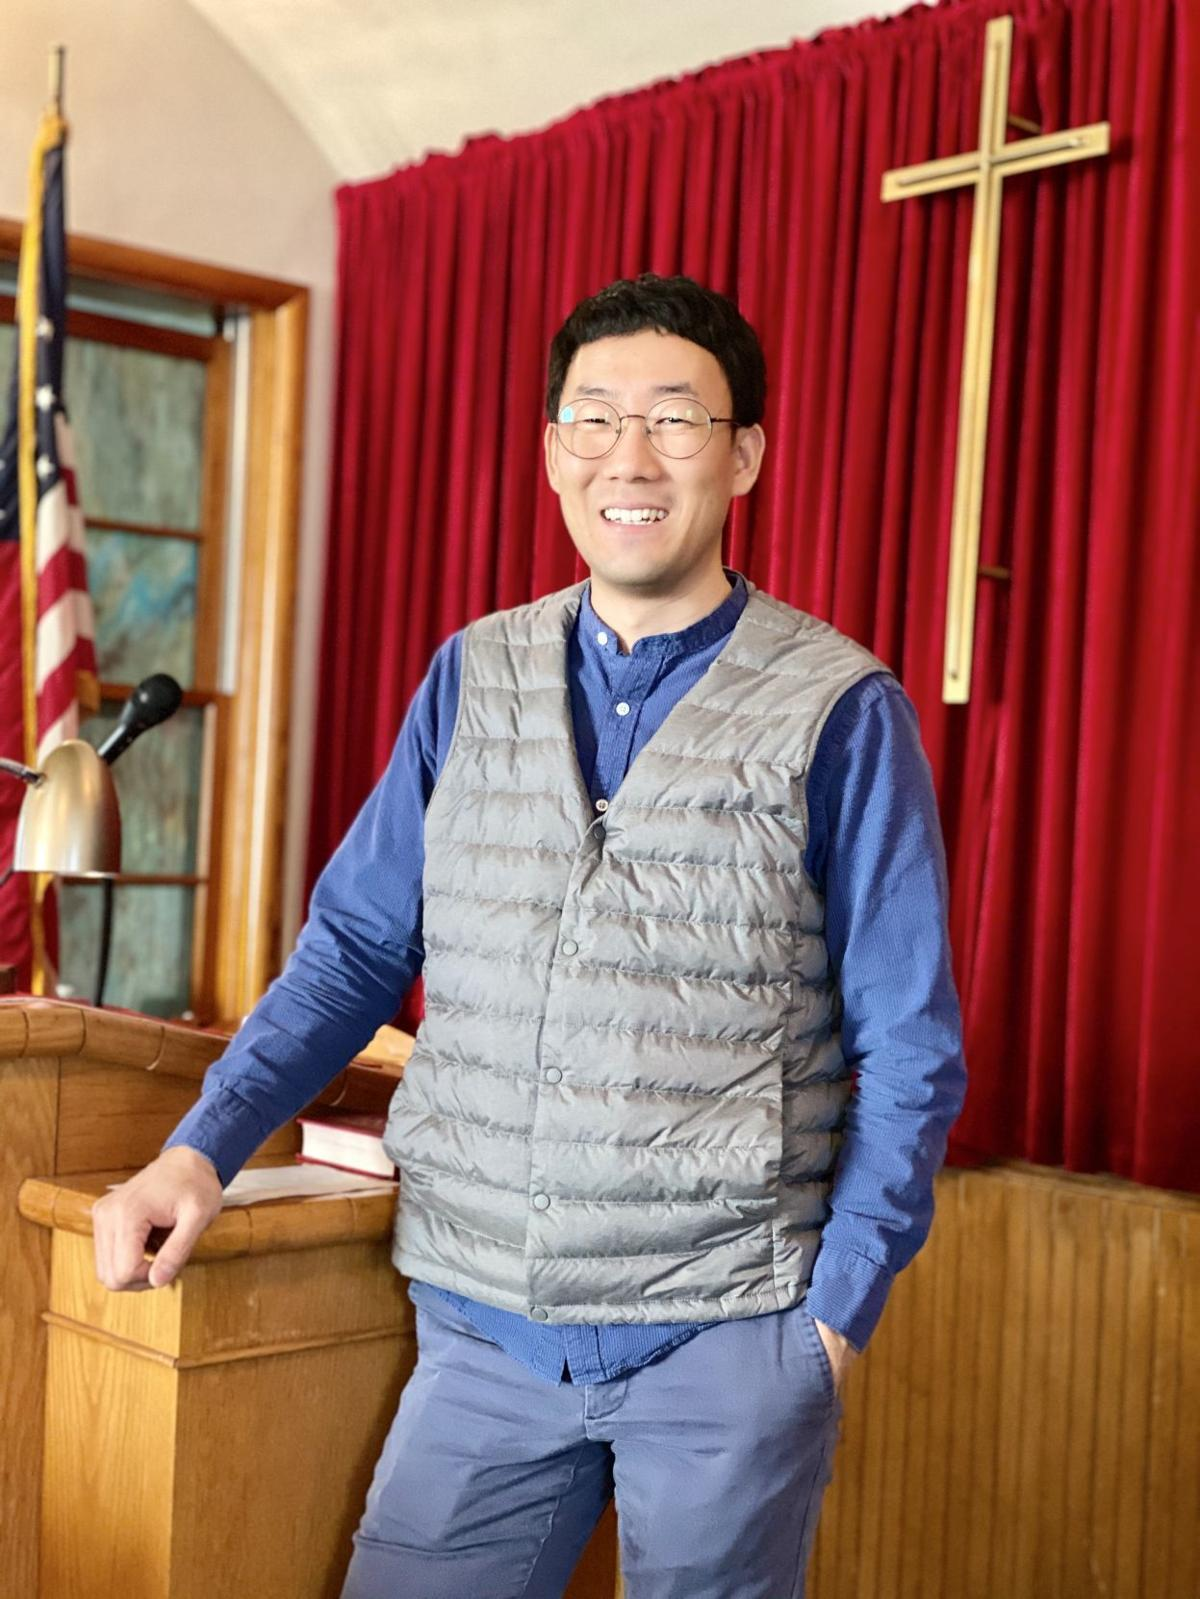 Marquand United Methodist Church Pastor Keyarae Yi